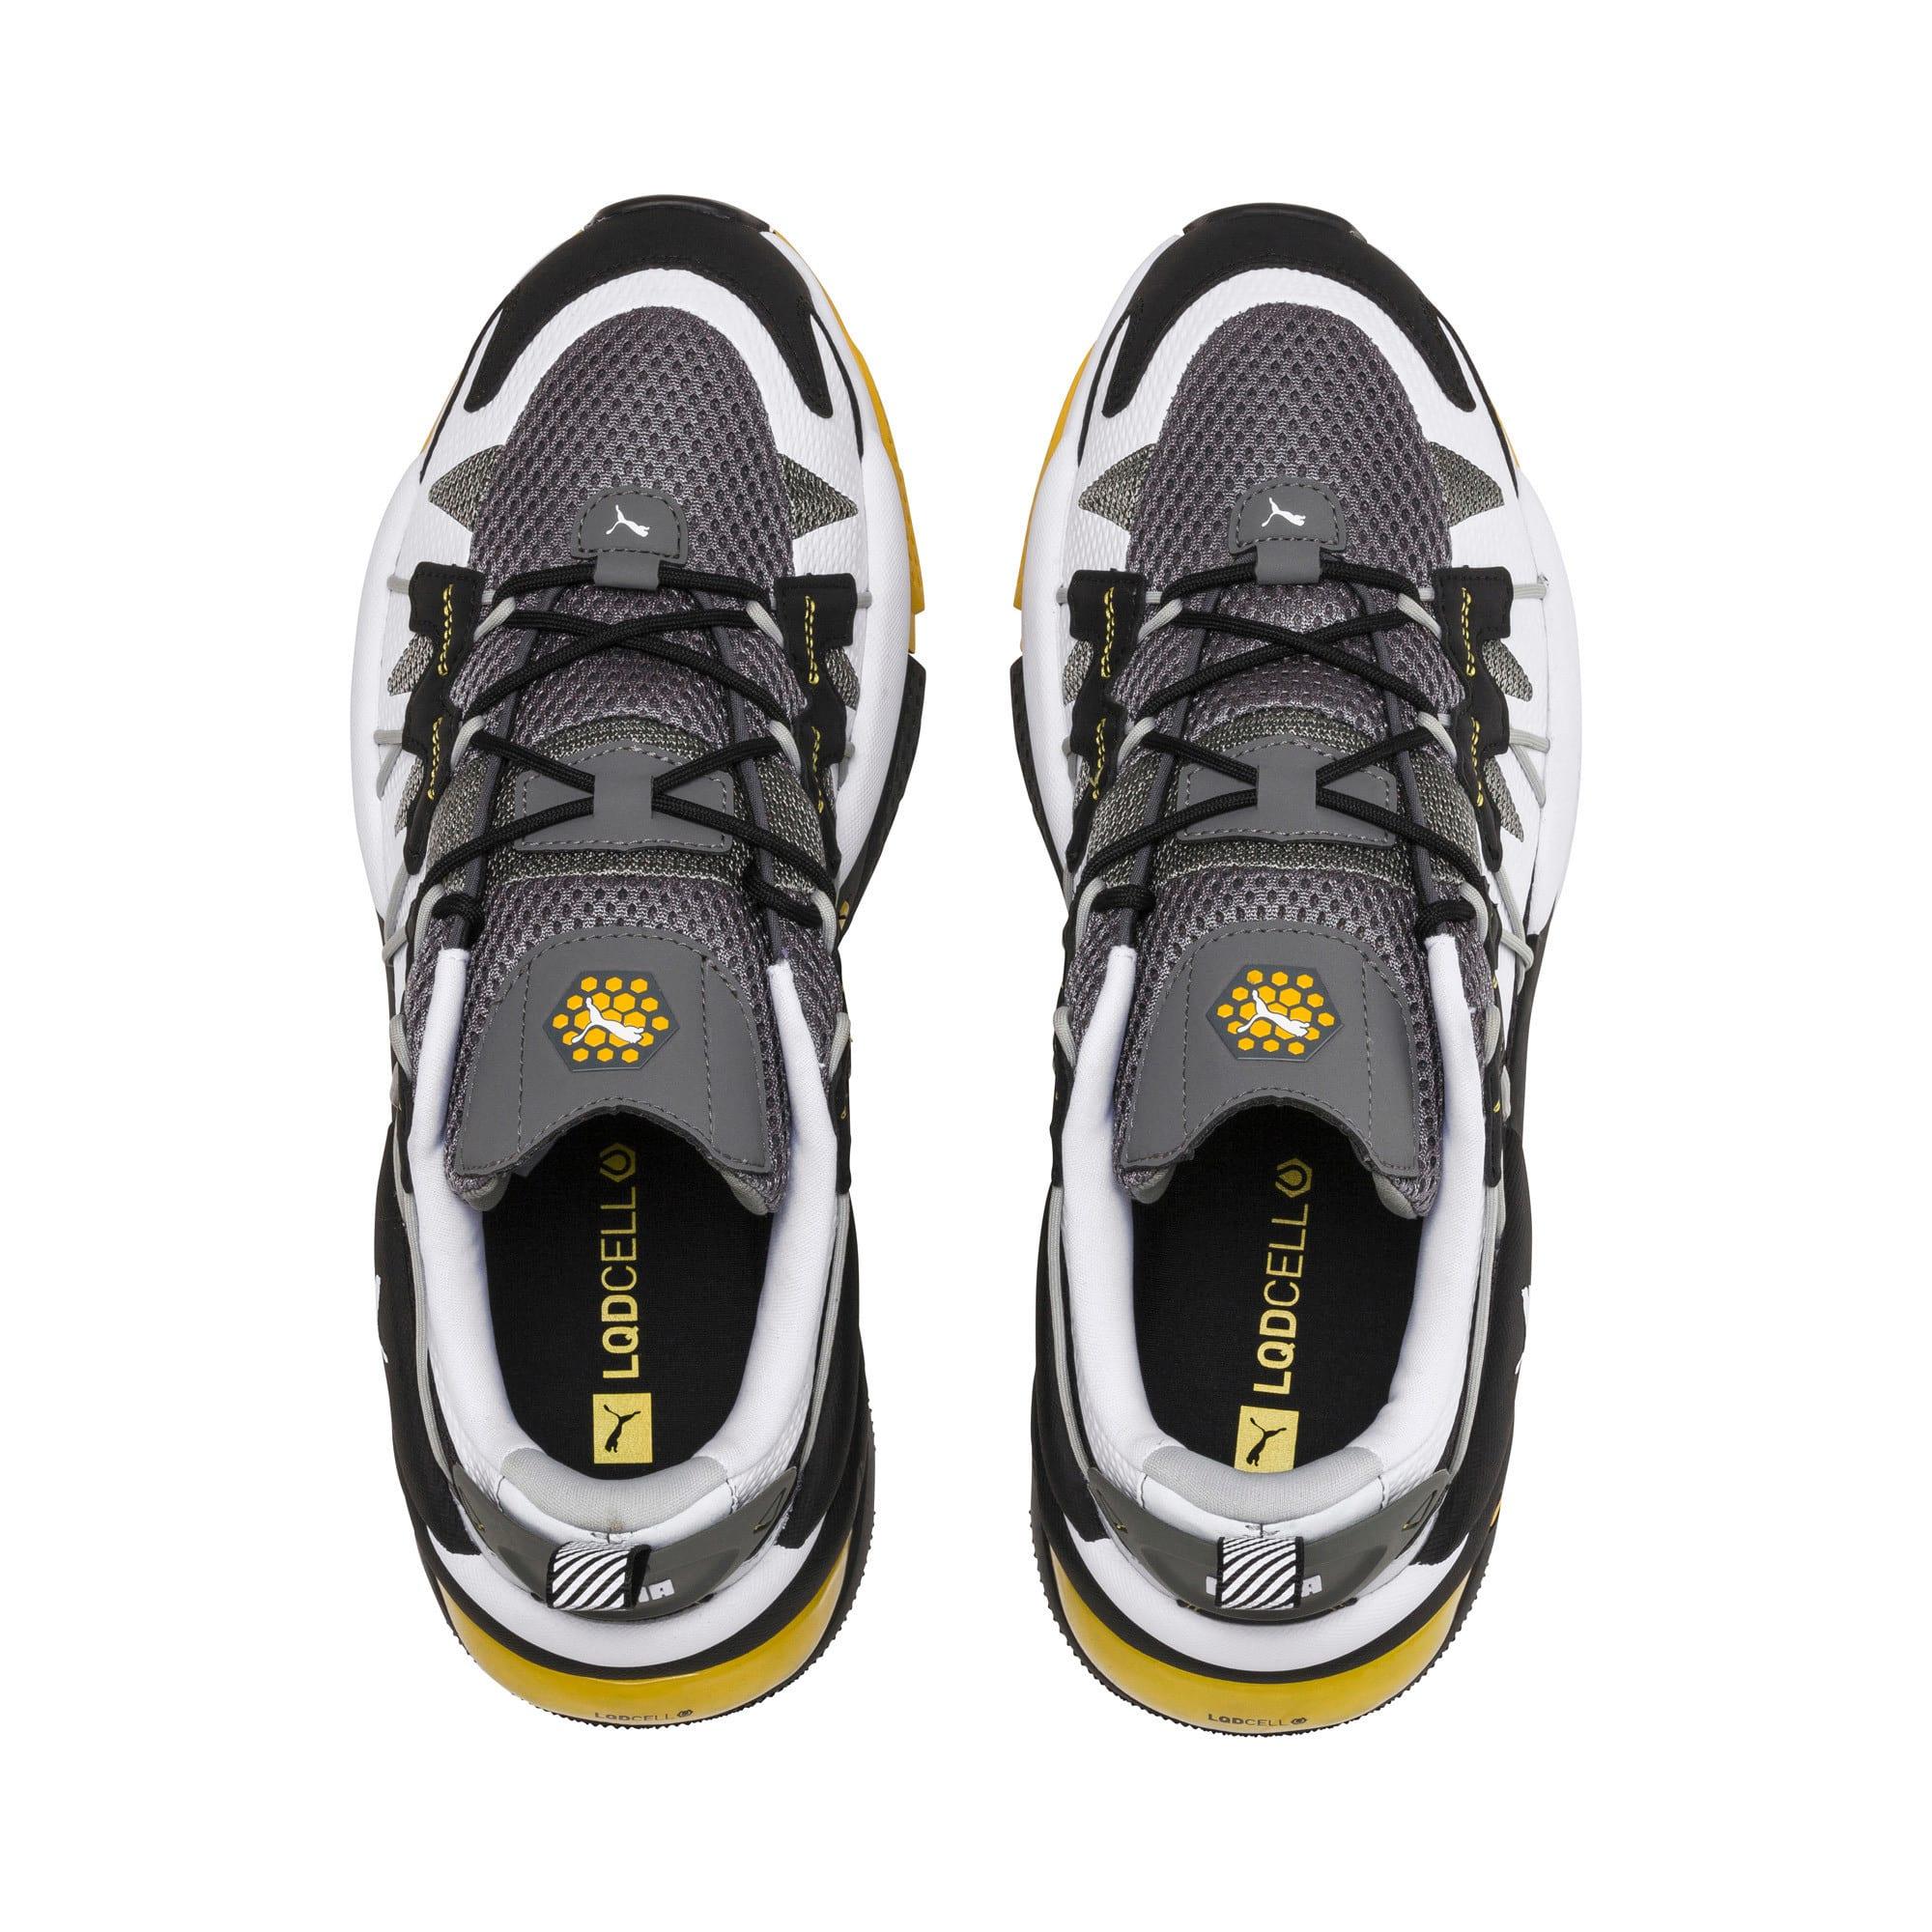 Thumbnail 6 of LQDCELL Omega Training Shoes, Puma Black-CASTLEROCK, medium